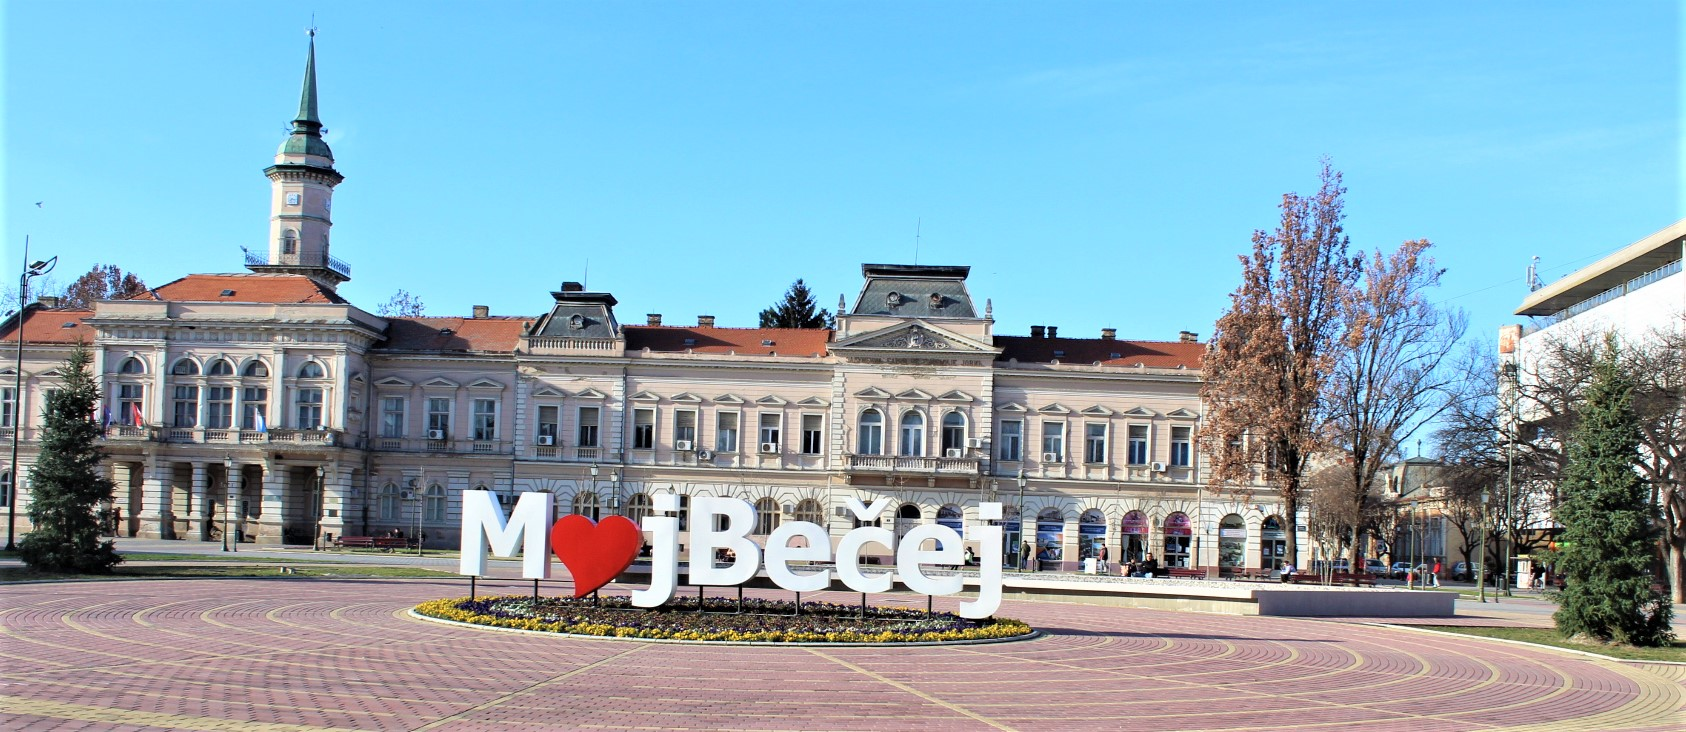 """Španske kraljice"" na centralnom gradskom trgu u Bečeju"